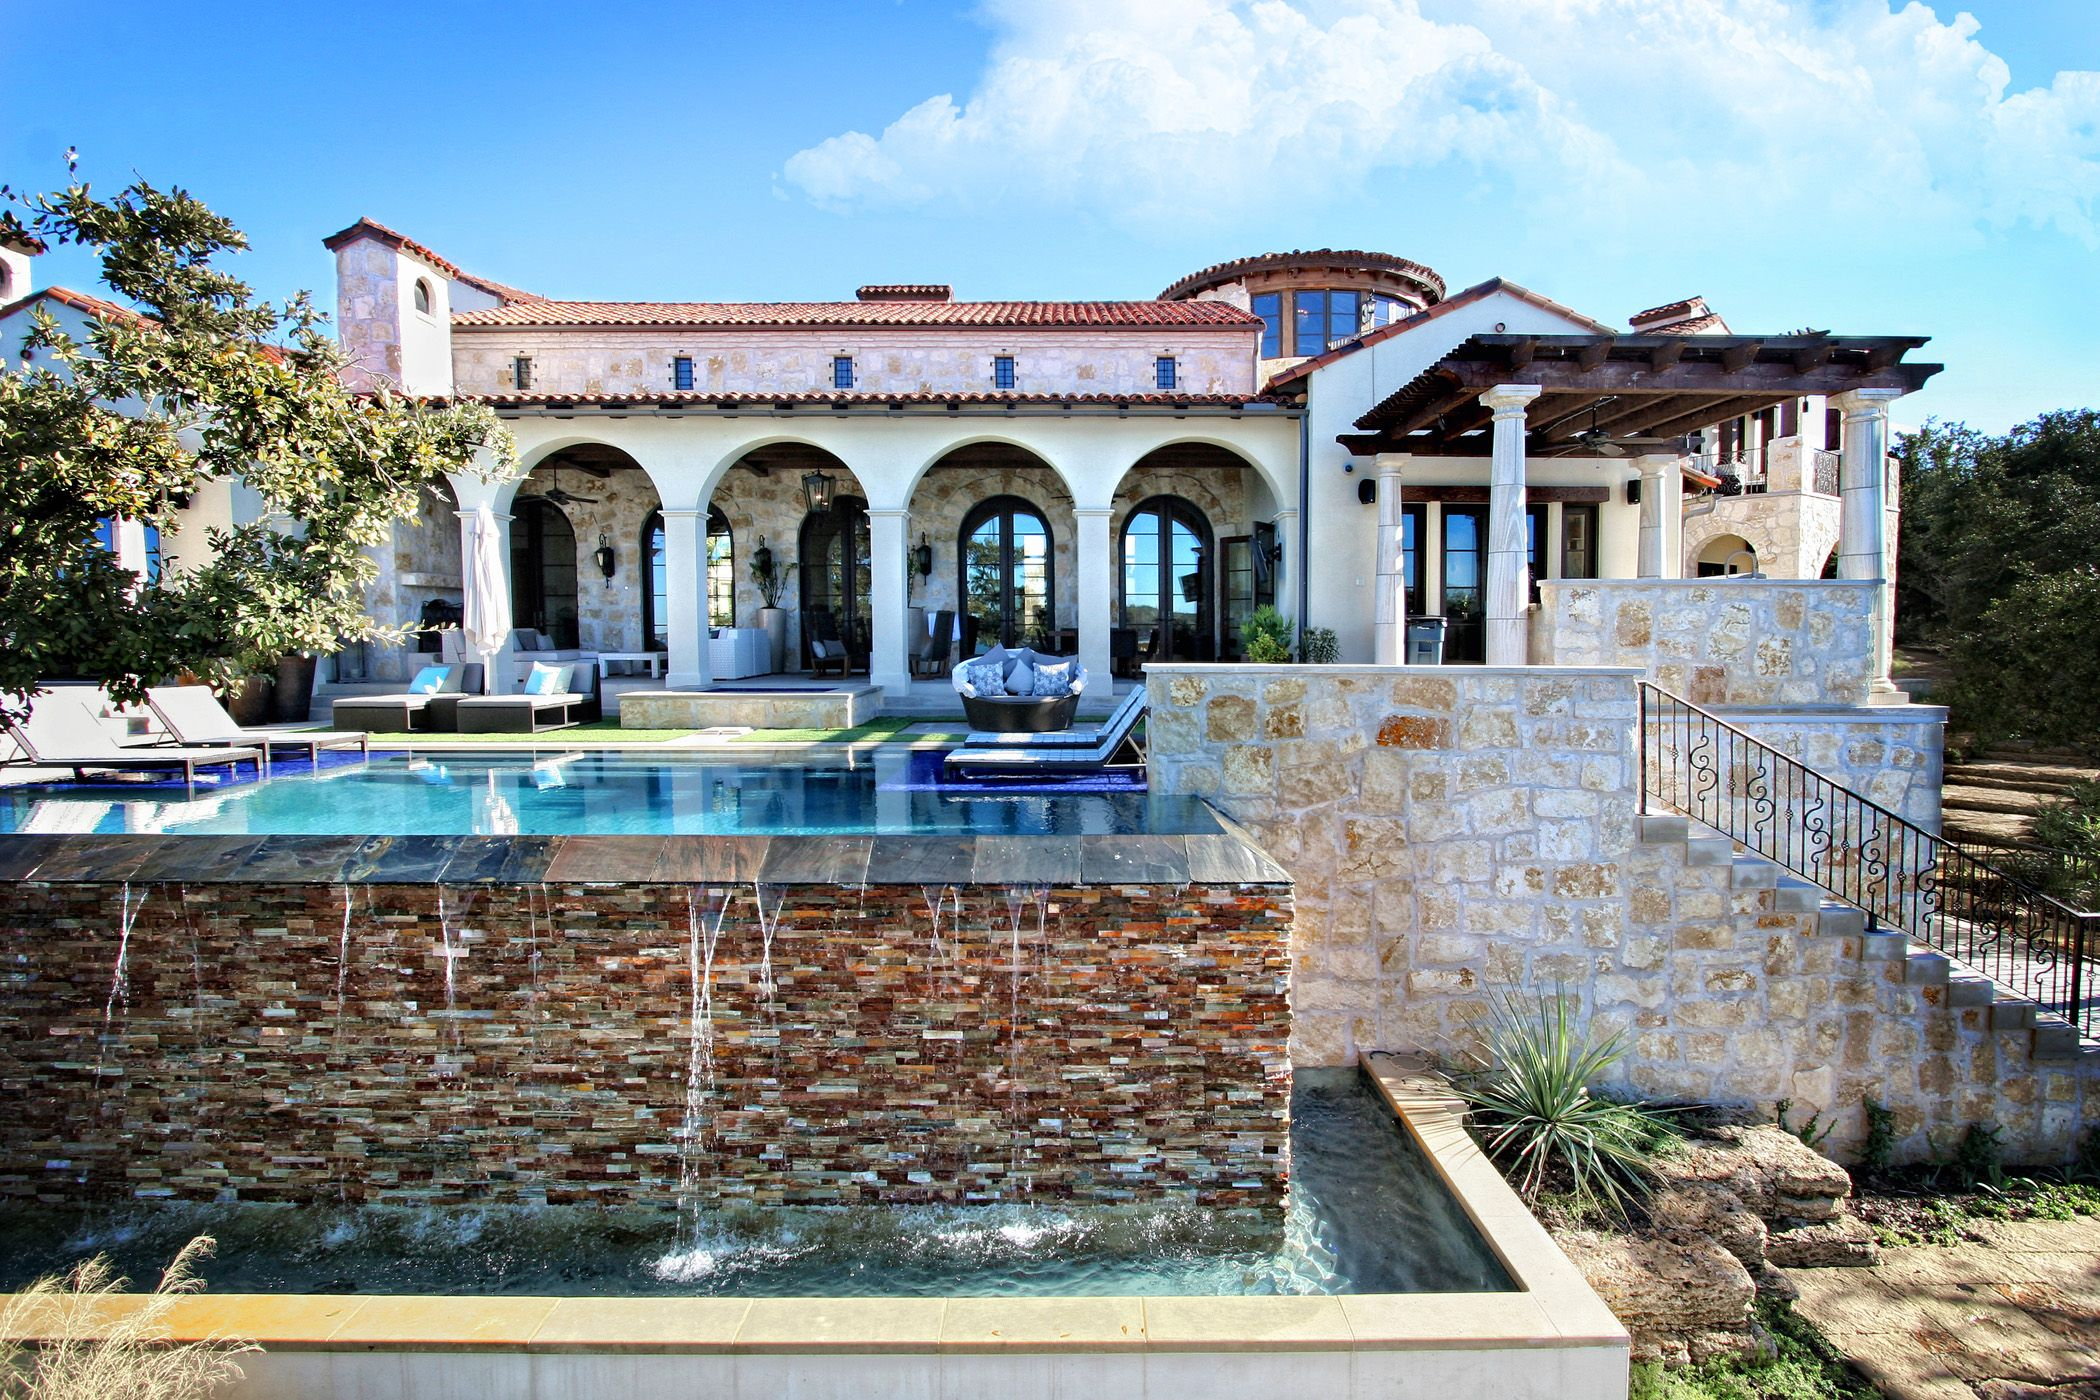 Horseshoe bay eclectic spanish lake house pool elevation for Lake house builders